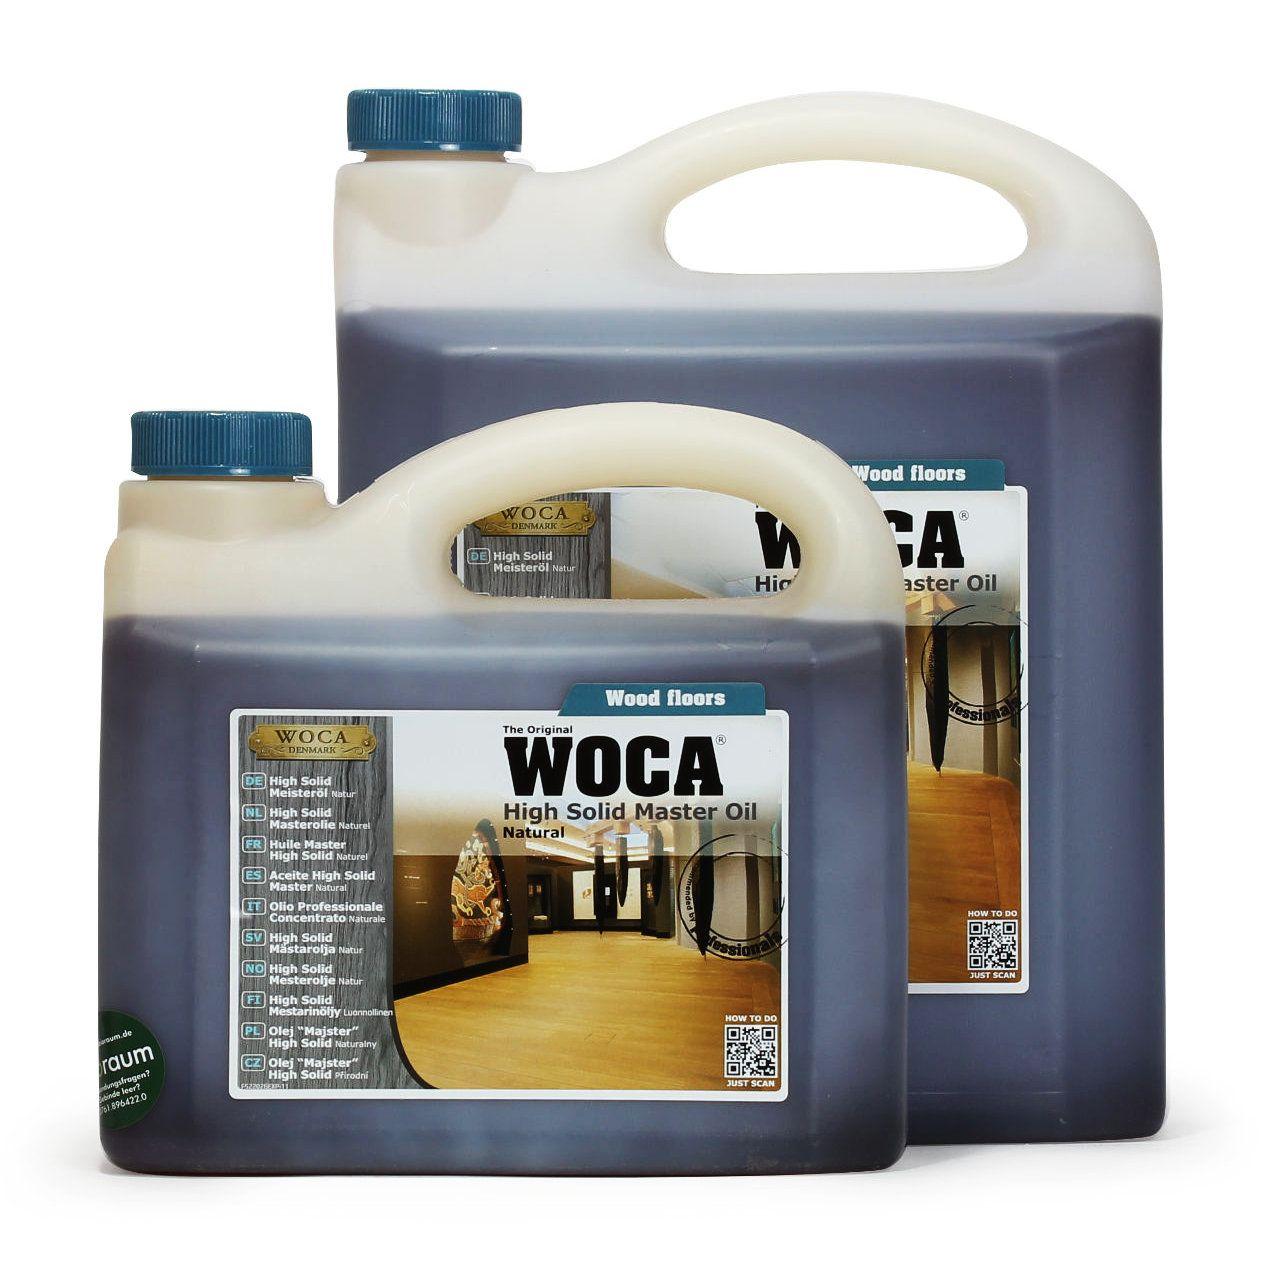 WOCA High Solid Messteröl im Farbton Natur